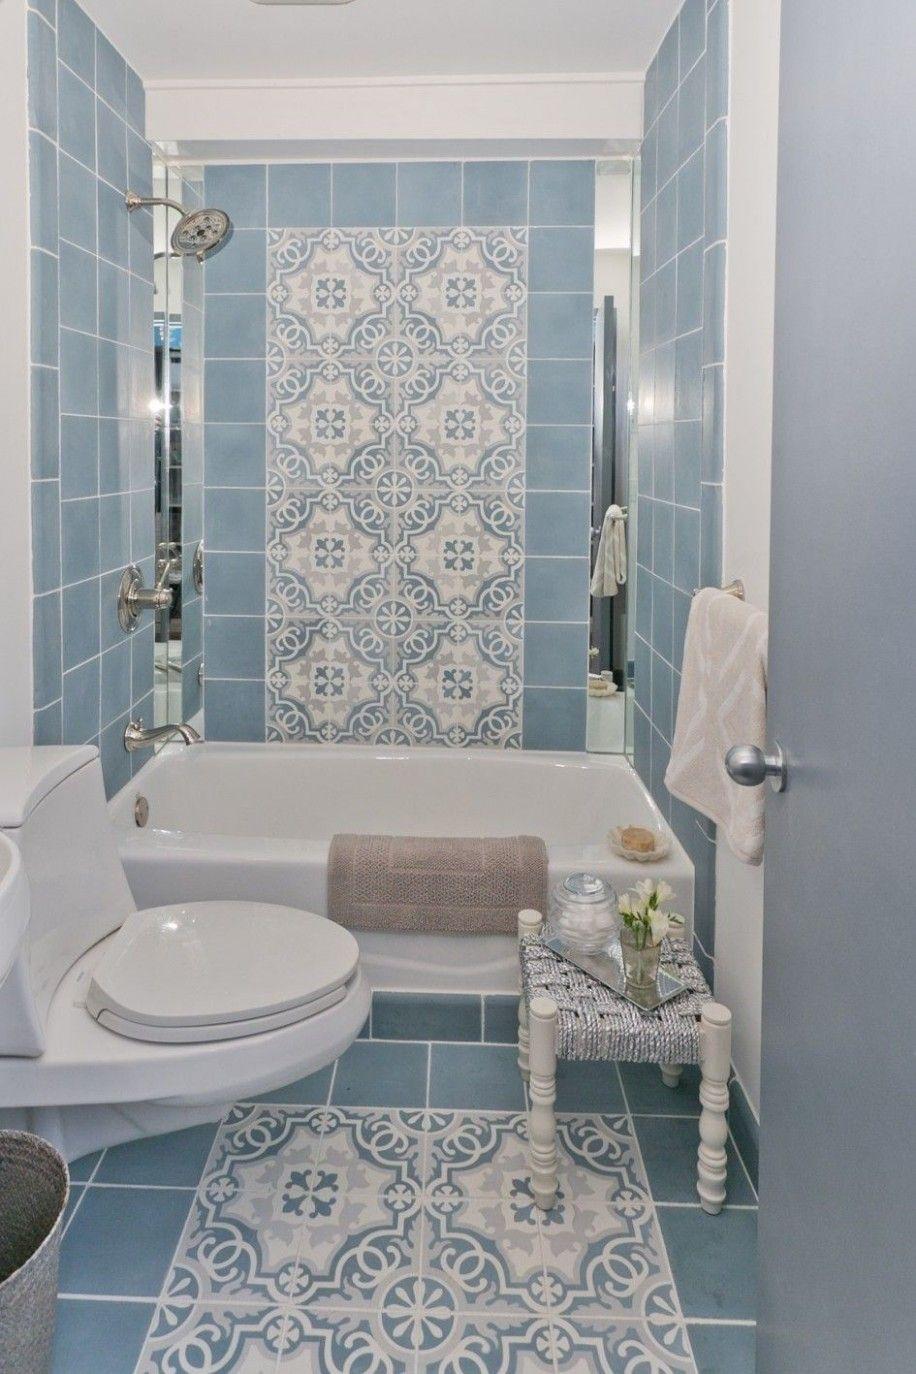 Vintage Blue Tile Bathroom Decorating Ideas Desain Interior Kamar Mandi Ide Lantai Kamar Mandi Kamar Mandi Mewah